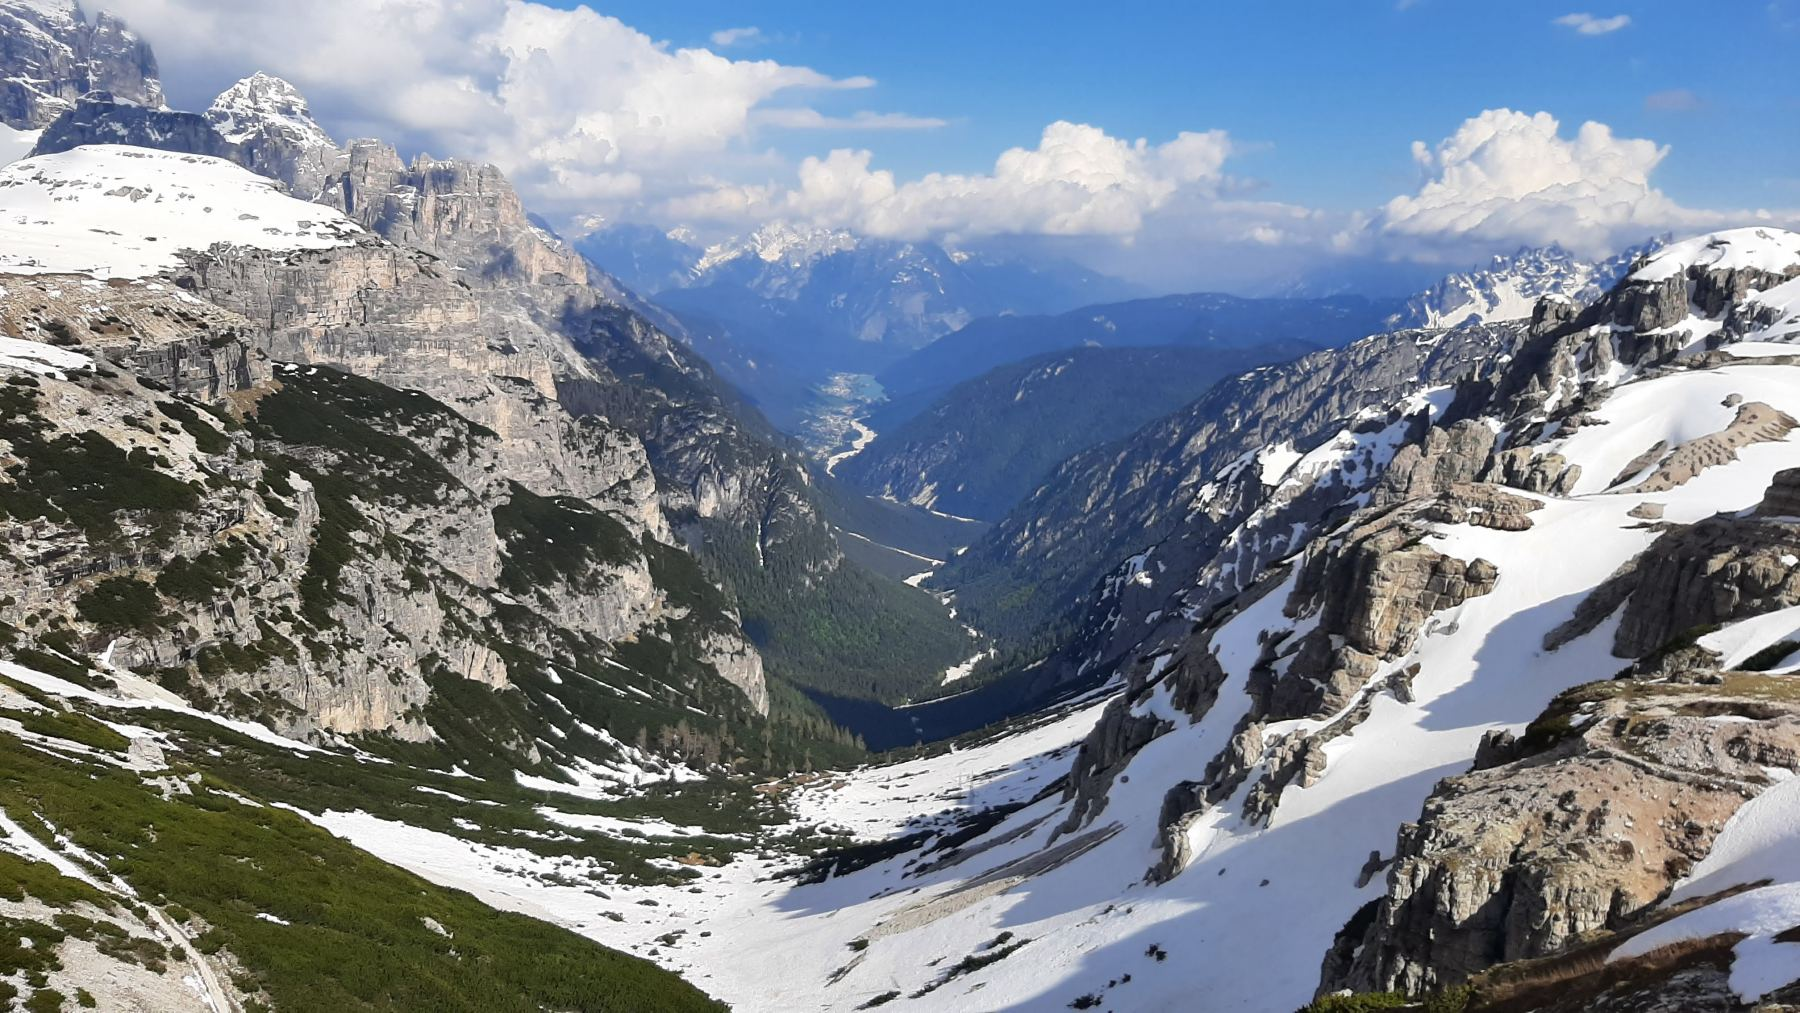 Pohled do údolí od Rifugio Auronzo